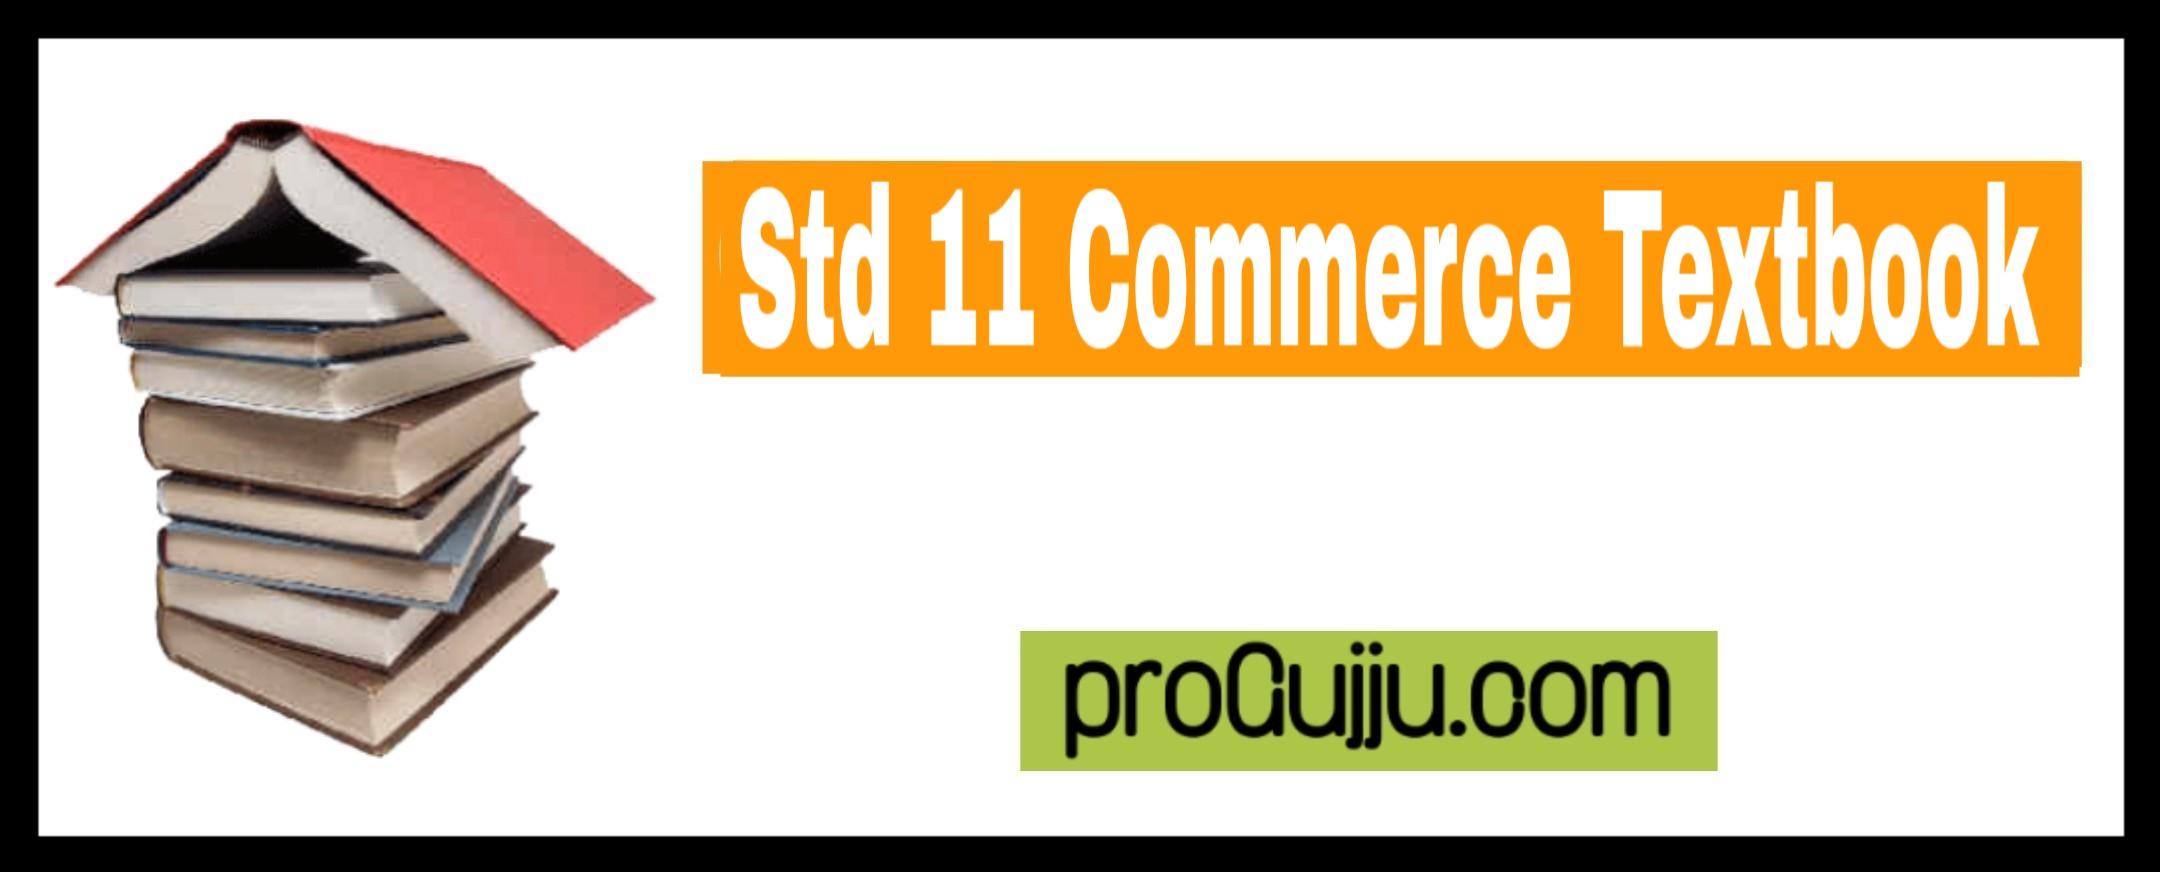 std 11 commerce textbook